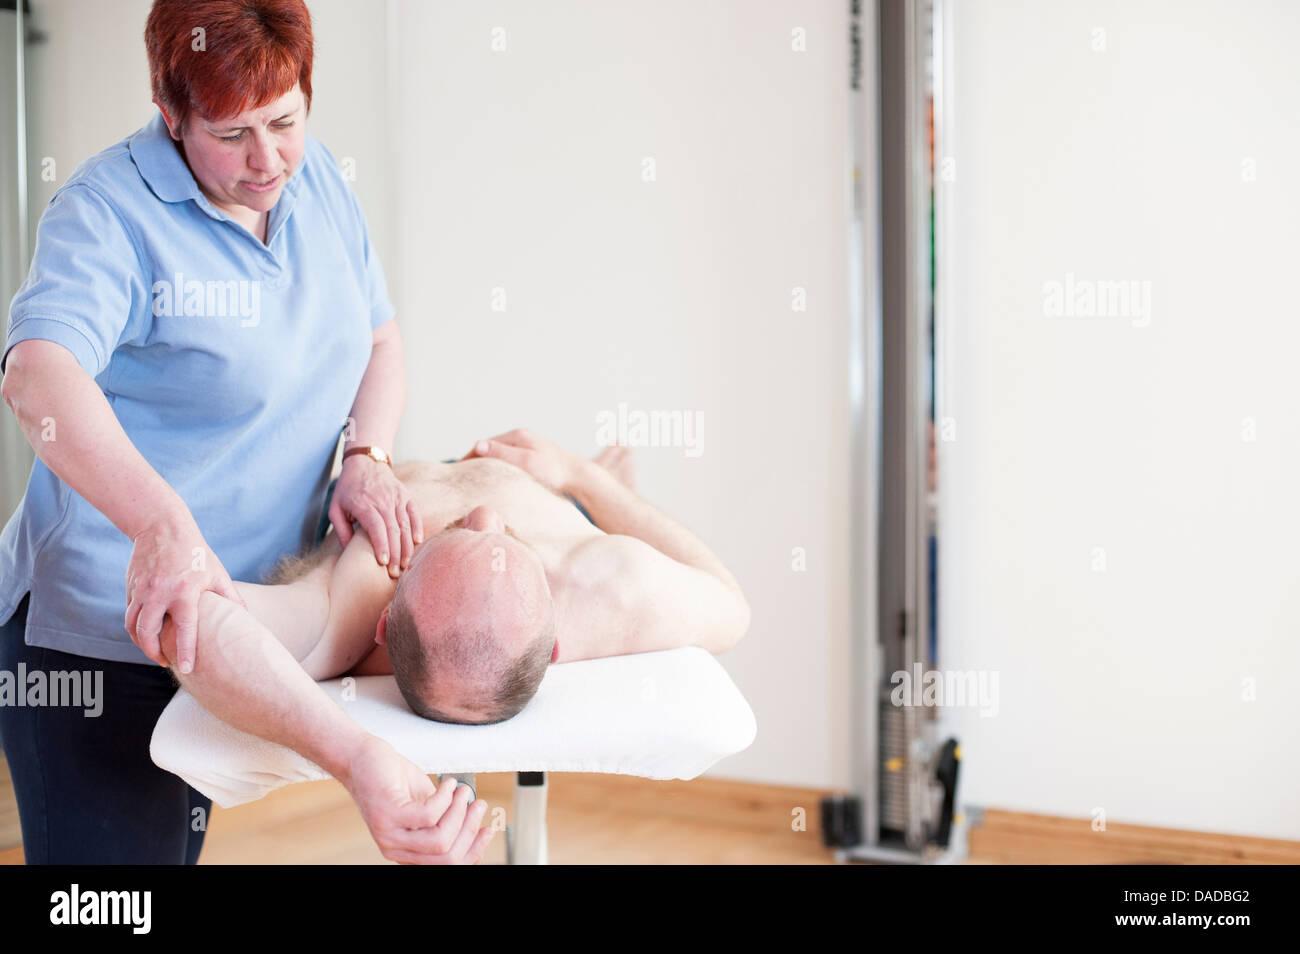 Frau und Mann massage-Behandlung Stockbild